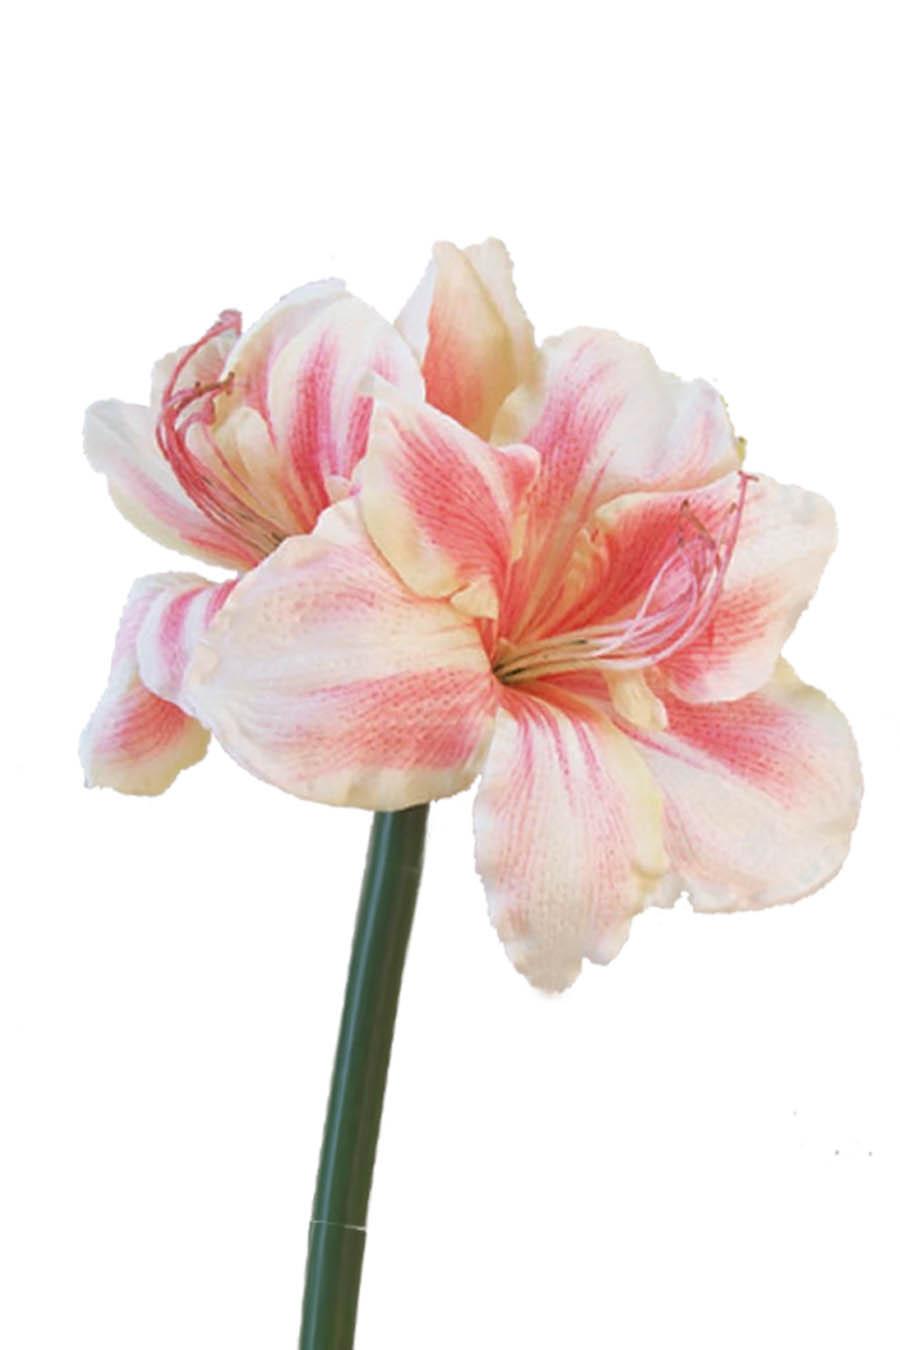 Amaryllis pink silk flowers artificial arrangements pene dene amaryllis pink artificial flower arrangement mightylinksfo